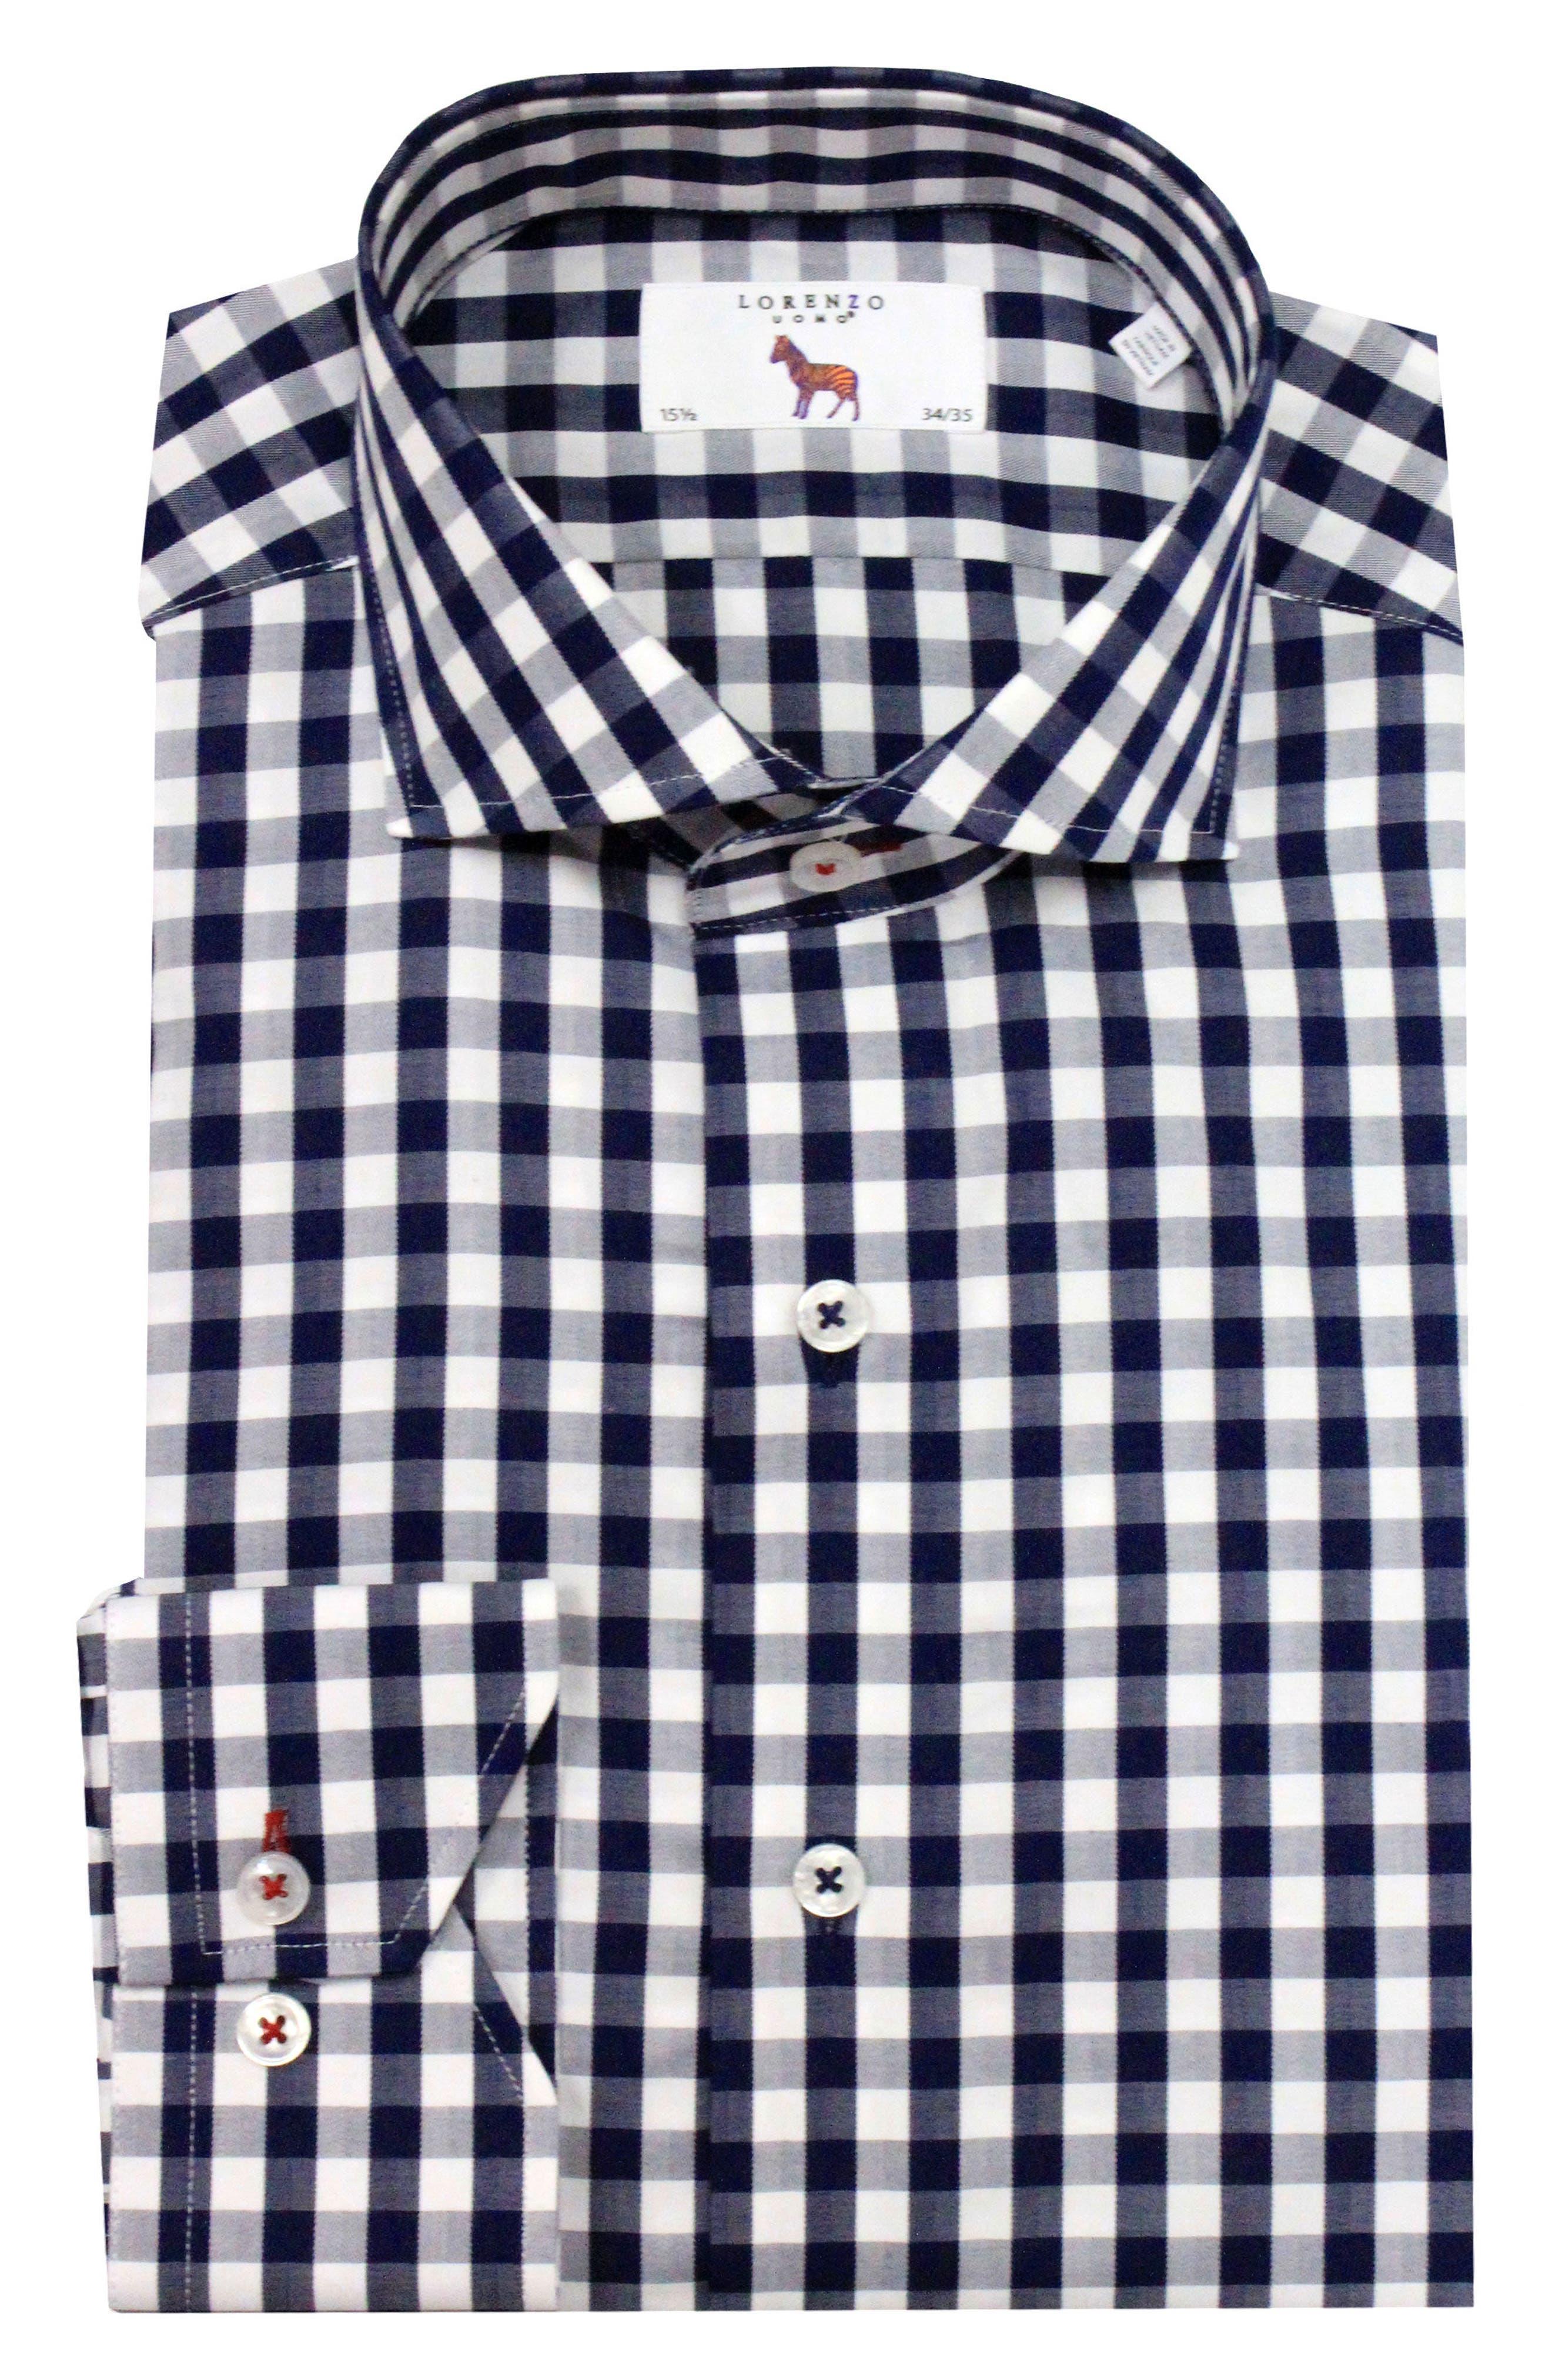 LORENZO UOMO Trim Fit Gingham Dress Shirt, Main, color, NAVY